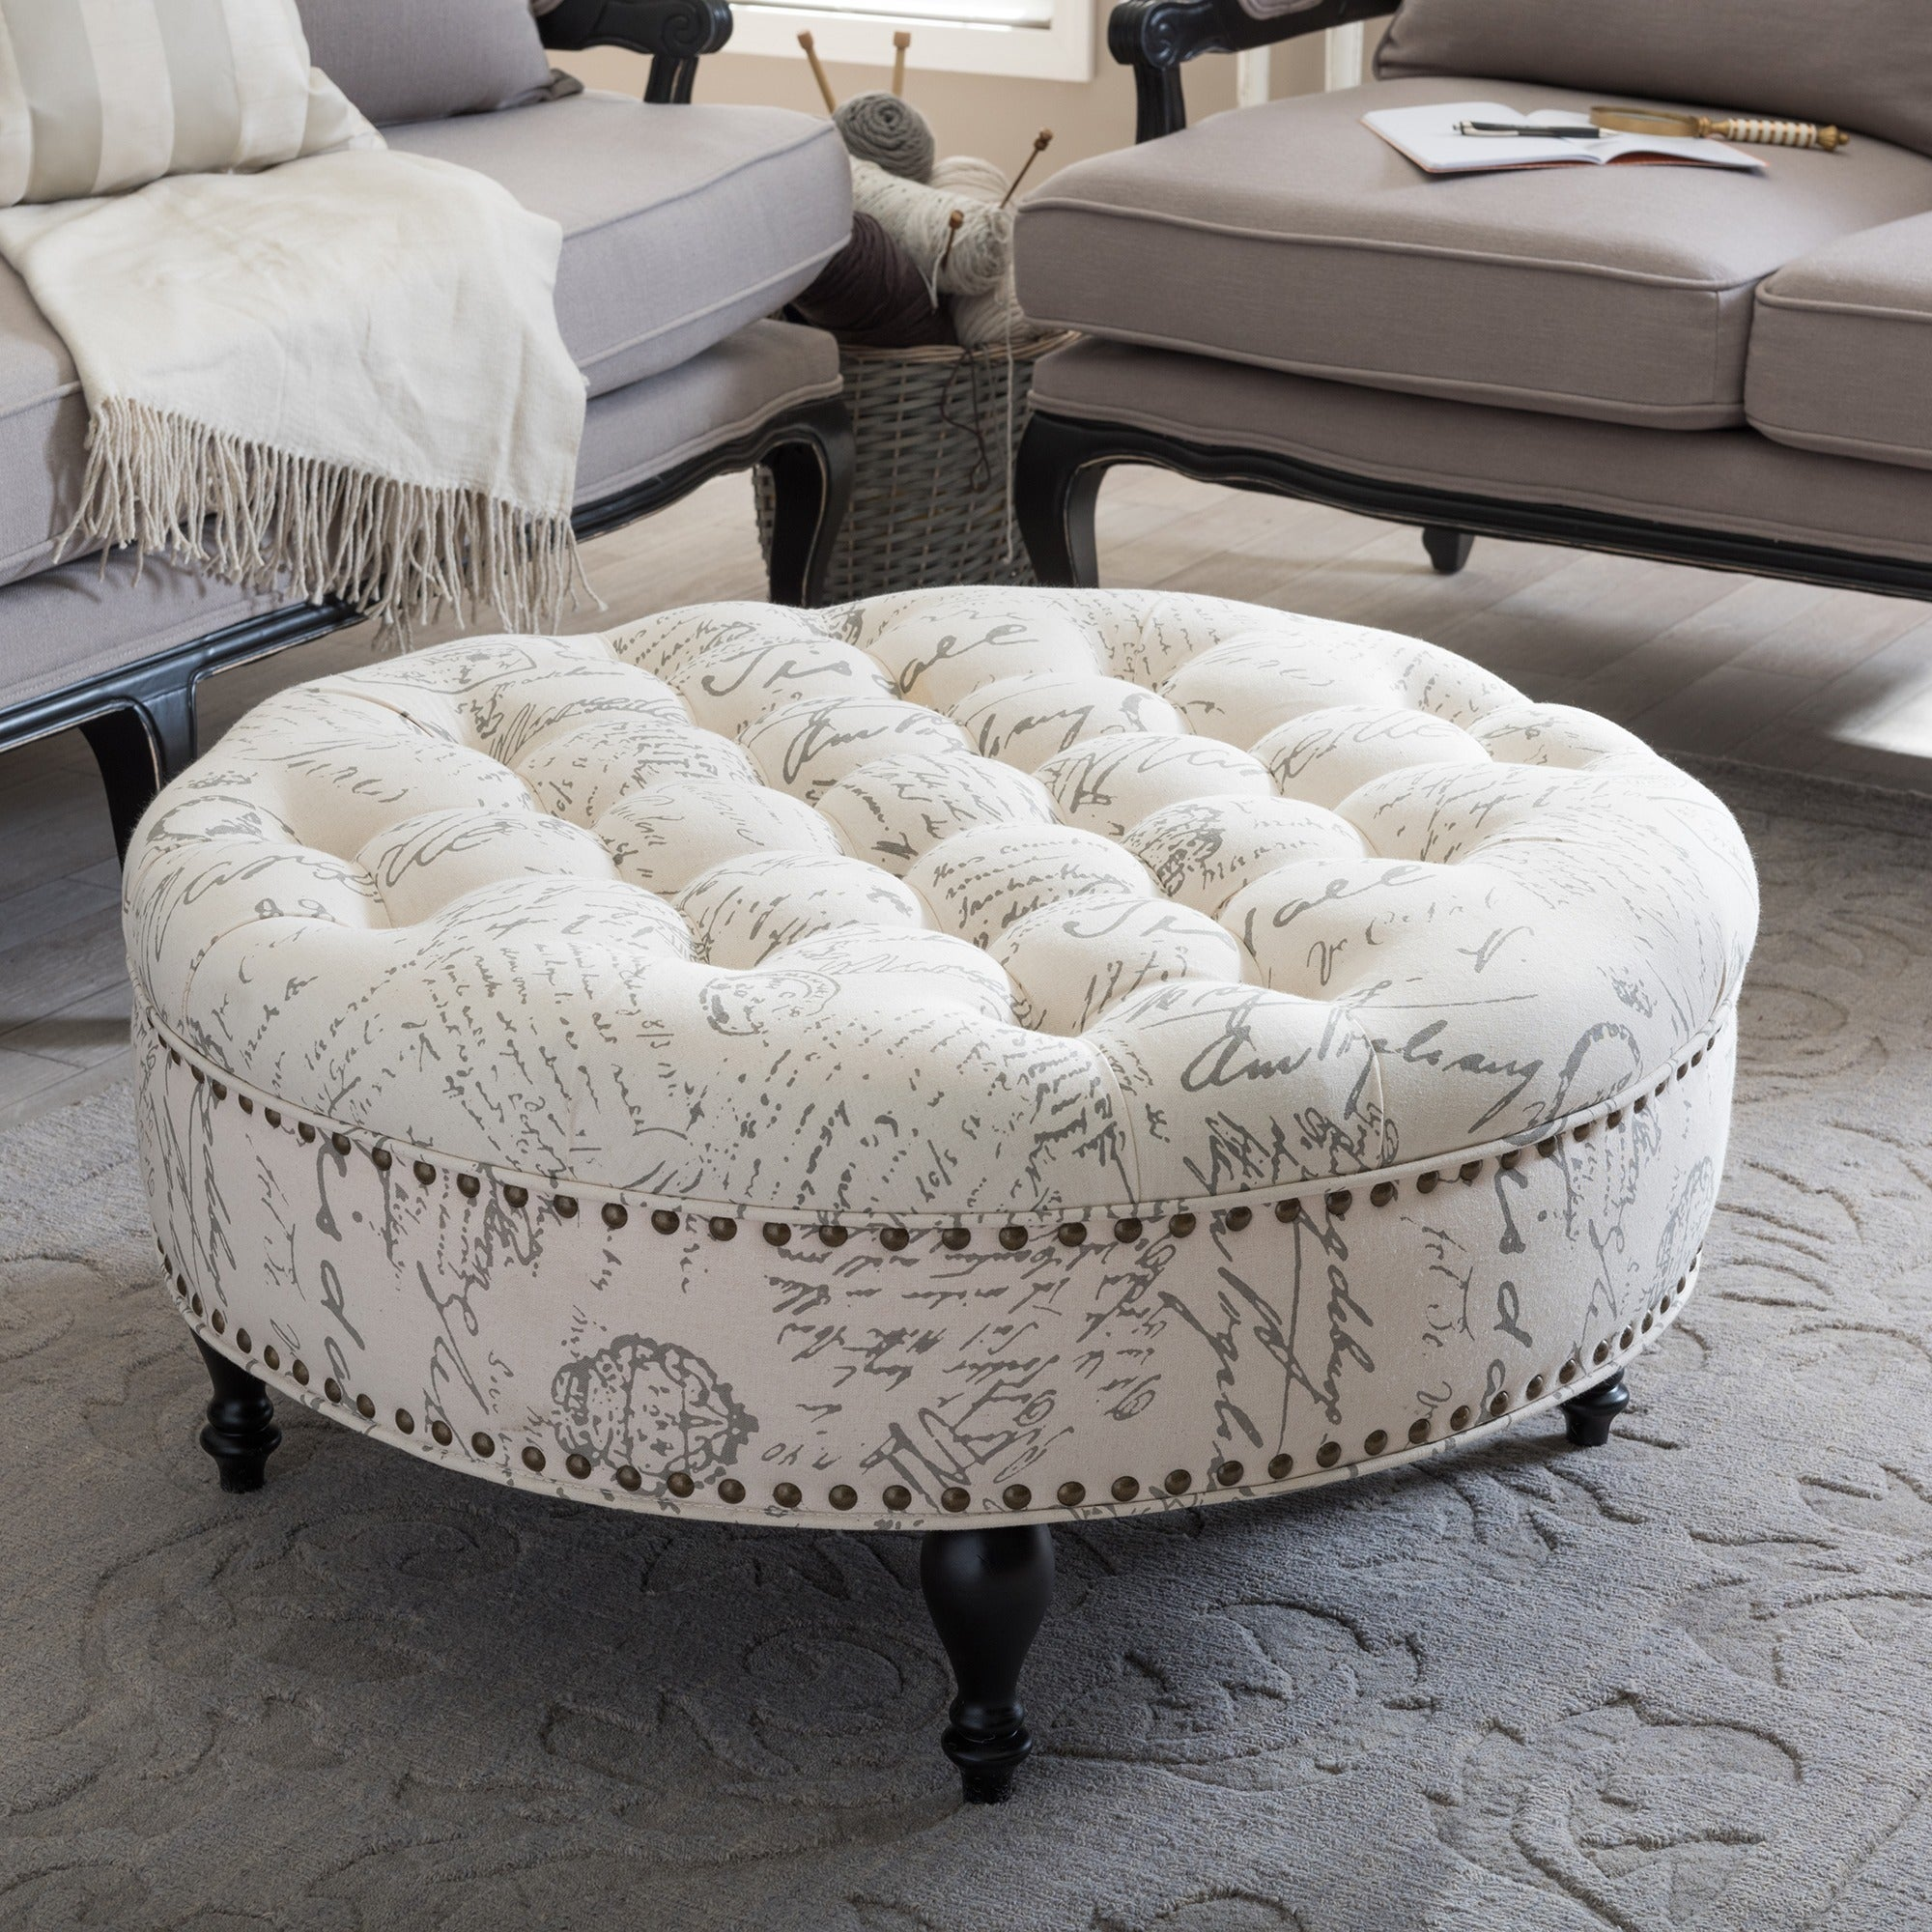 Astonishing Palfrey Patterned Linen Modern Tufted Ottoman Camellatalisay Diy Chair Ideas Camellatalisaycom